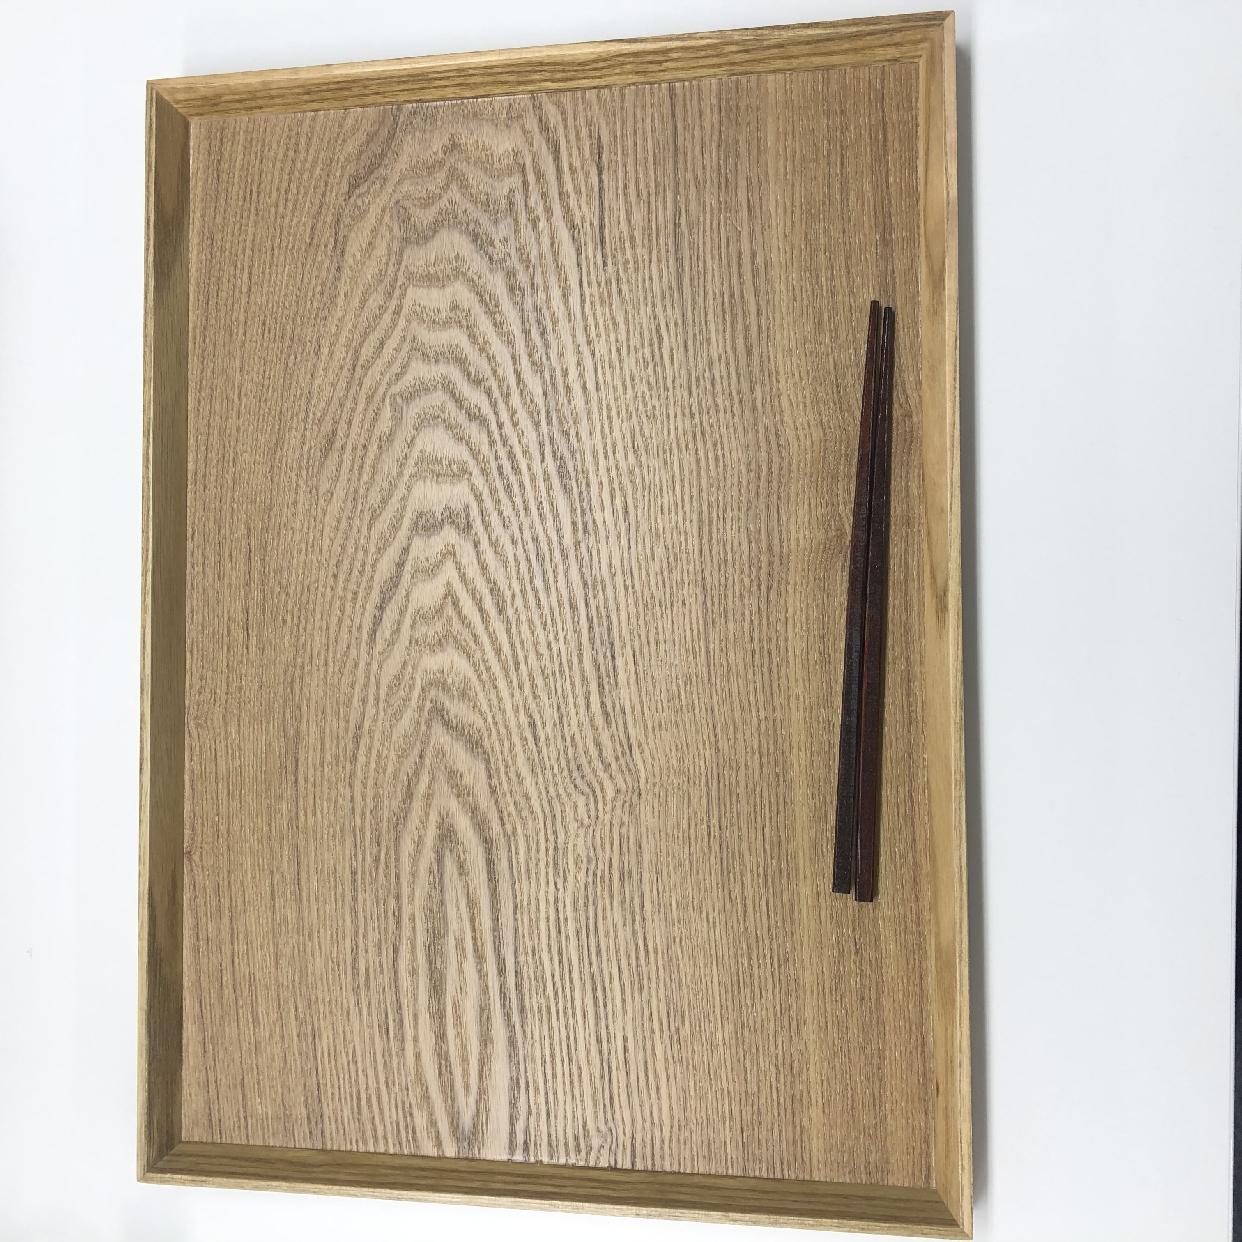 Table Ware East(テーブルウェアイースト)木製 ナチュラルスタックトレー44cm(LL)を使った わっきーさんの口コミ画像2